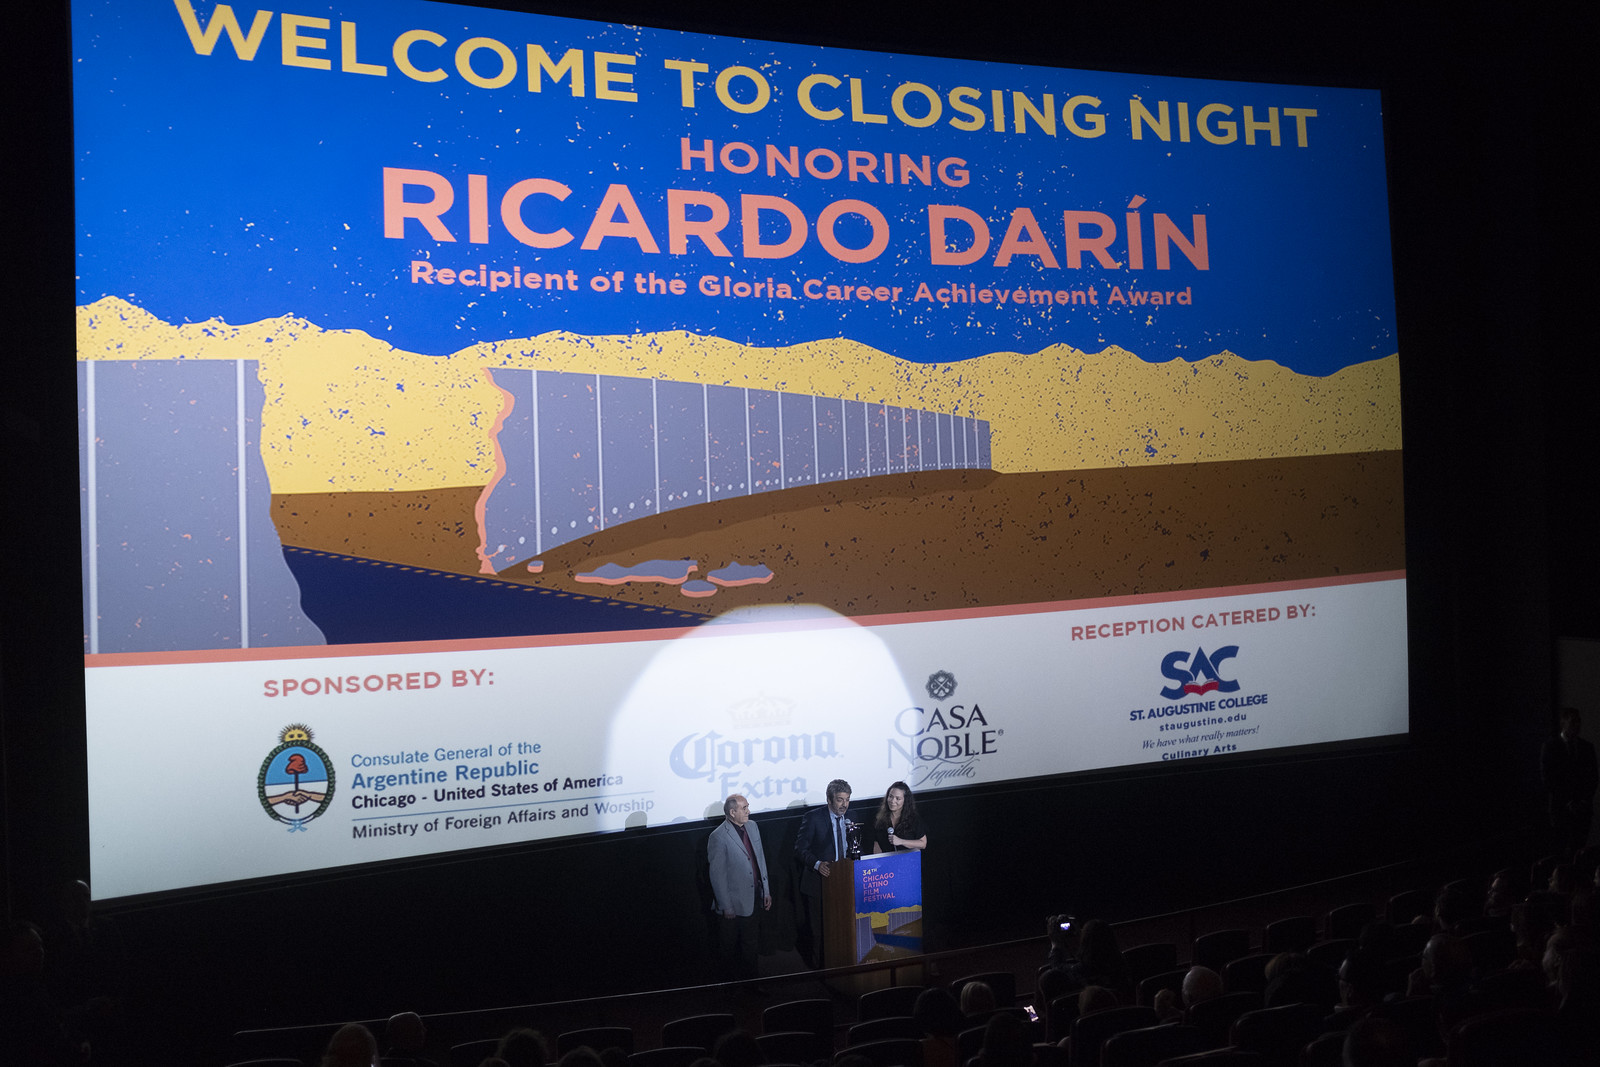 34th CLFF- Closing Night: Honoring Ricardo Darín